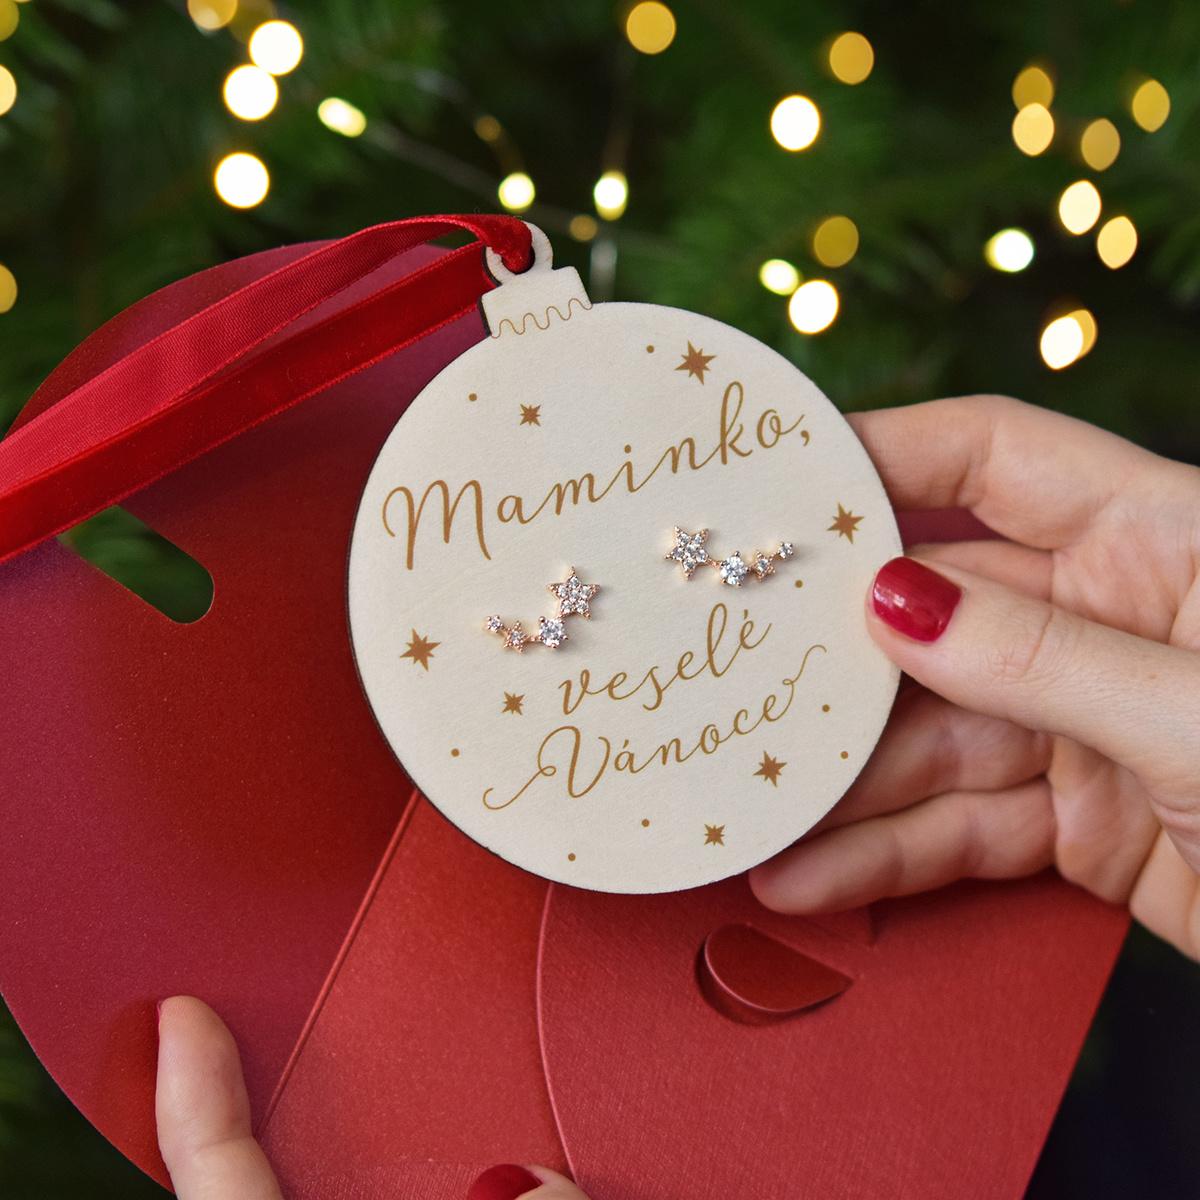 HOUSEDECOR Baňka s náušnicemi - Maminko, veselé Vánoce růžové zlato barva